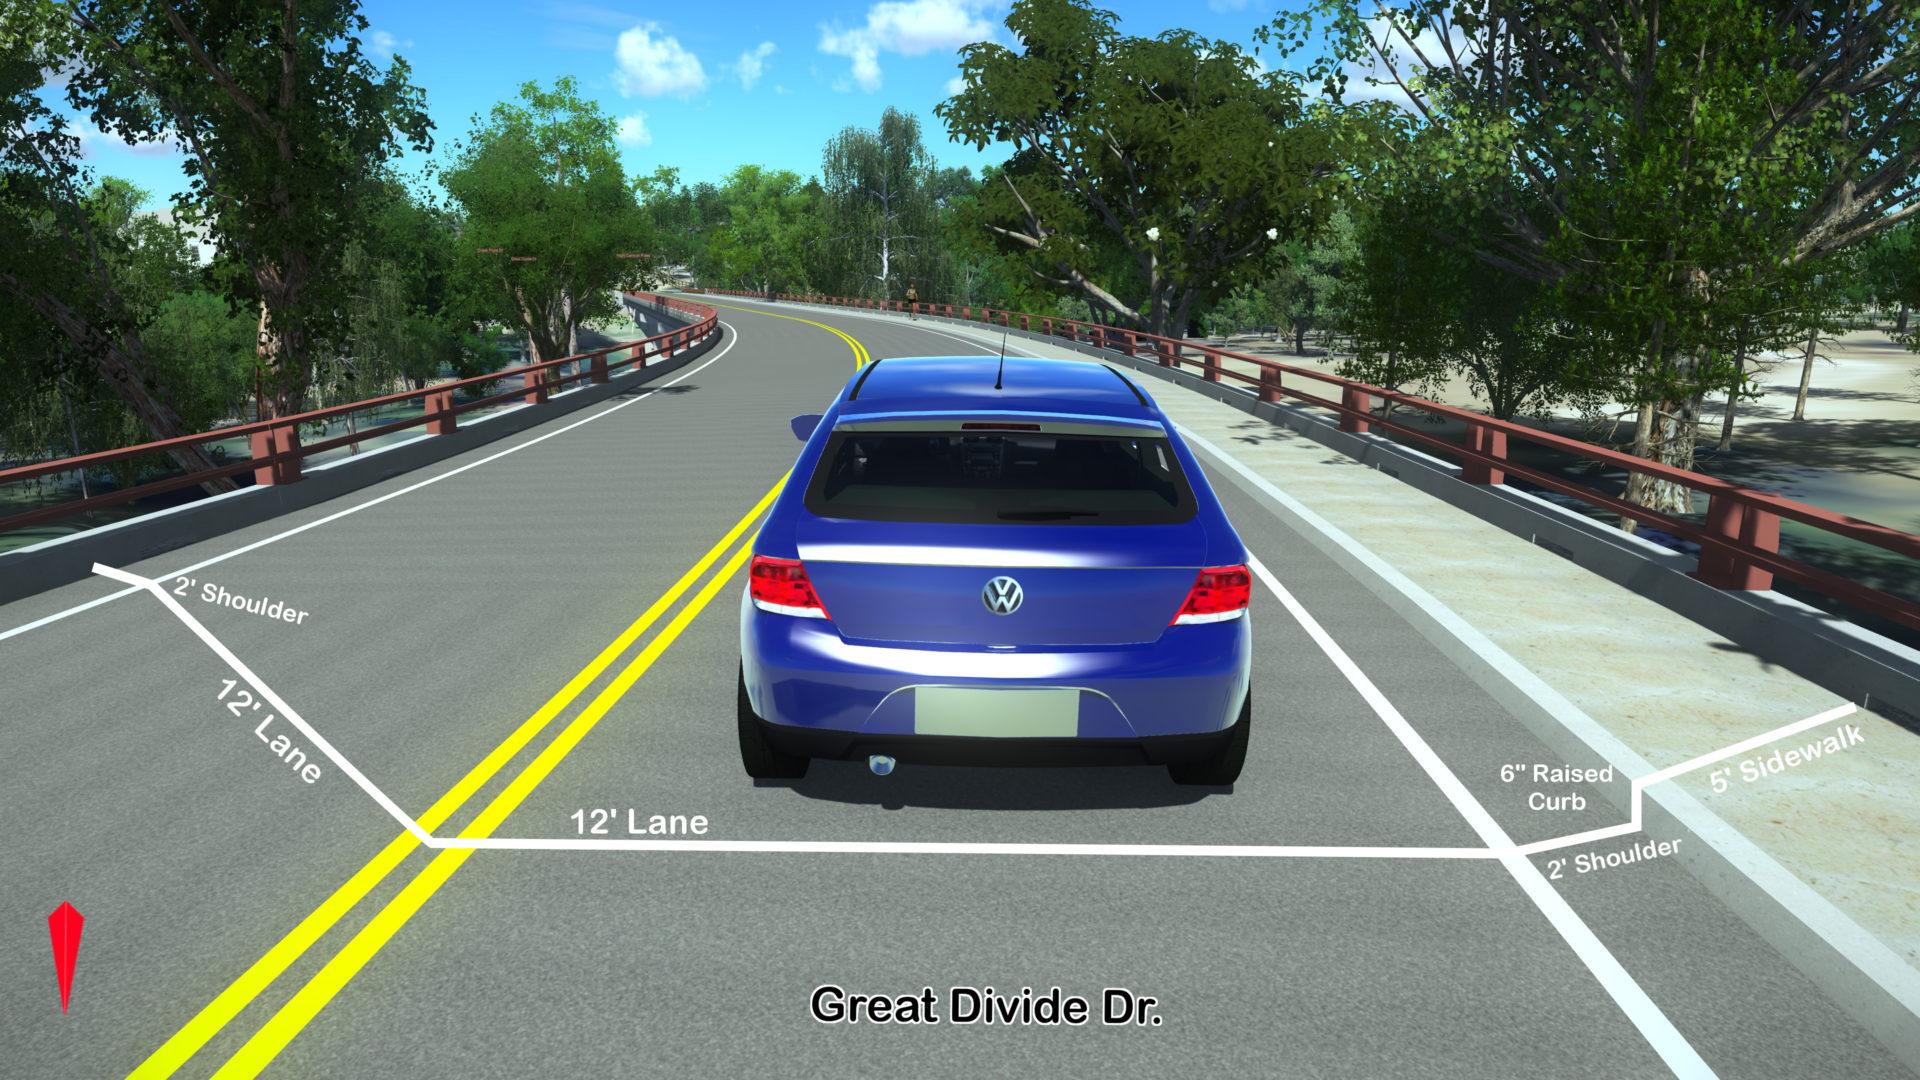 LumenRT microstation Openroads LumenRT 3D modeling visualization